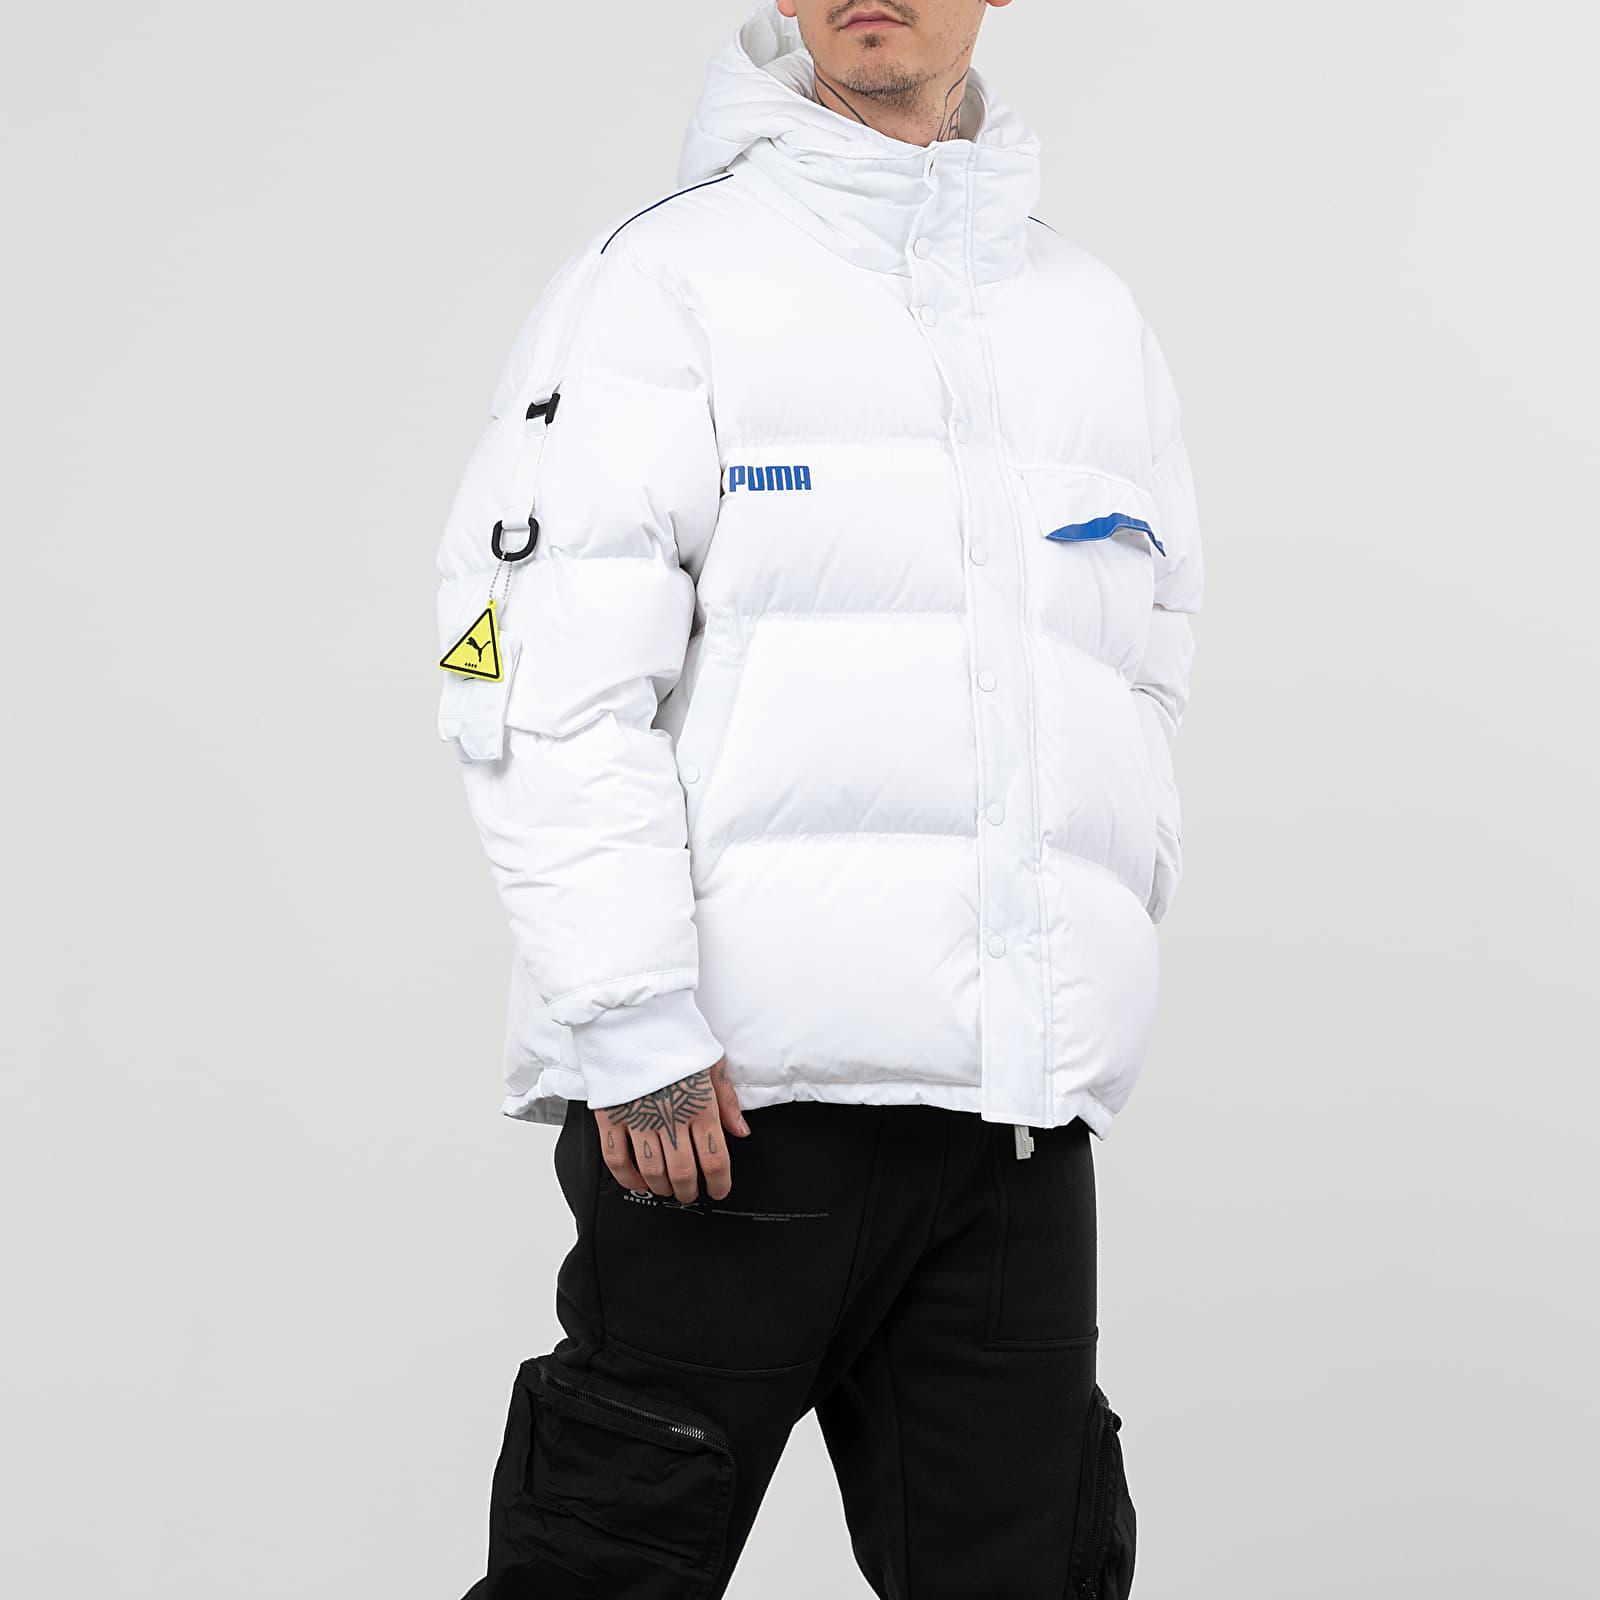 Puma x Ader Down Puffer Jacket